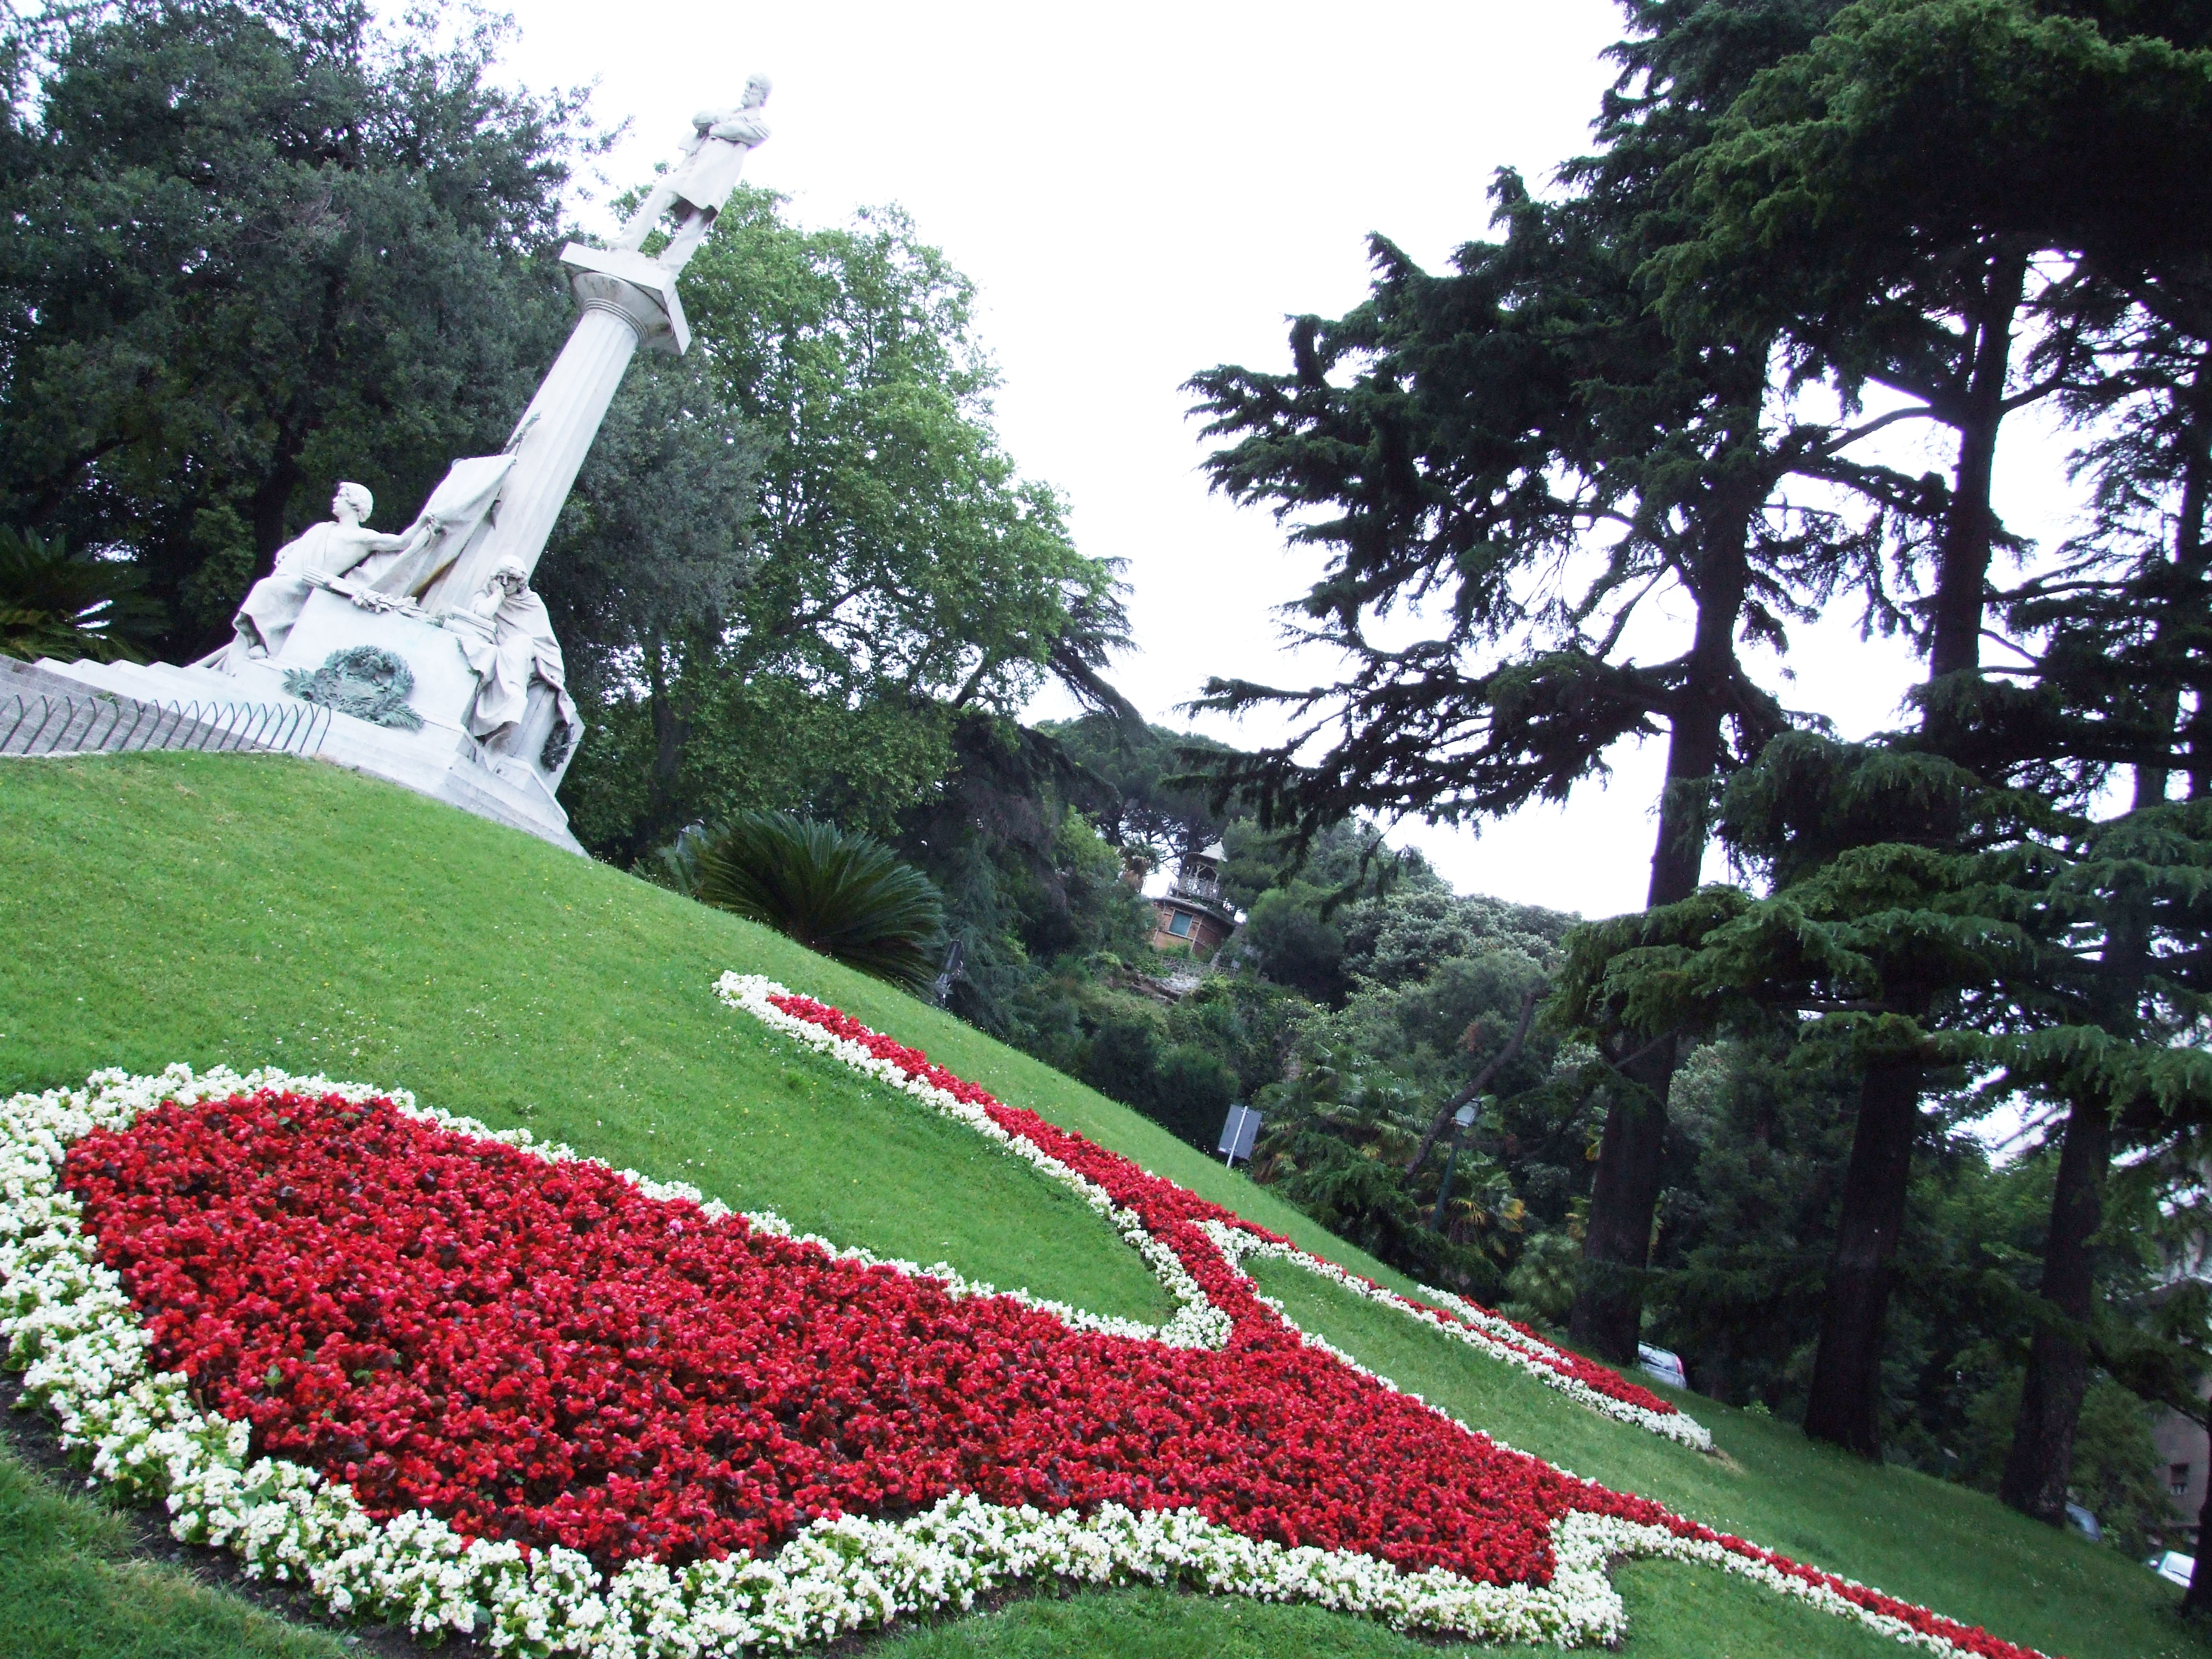 Genova liguria italy - creative commons by gnuckx photo